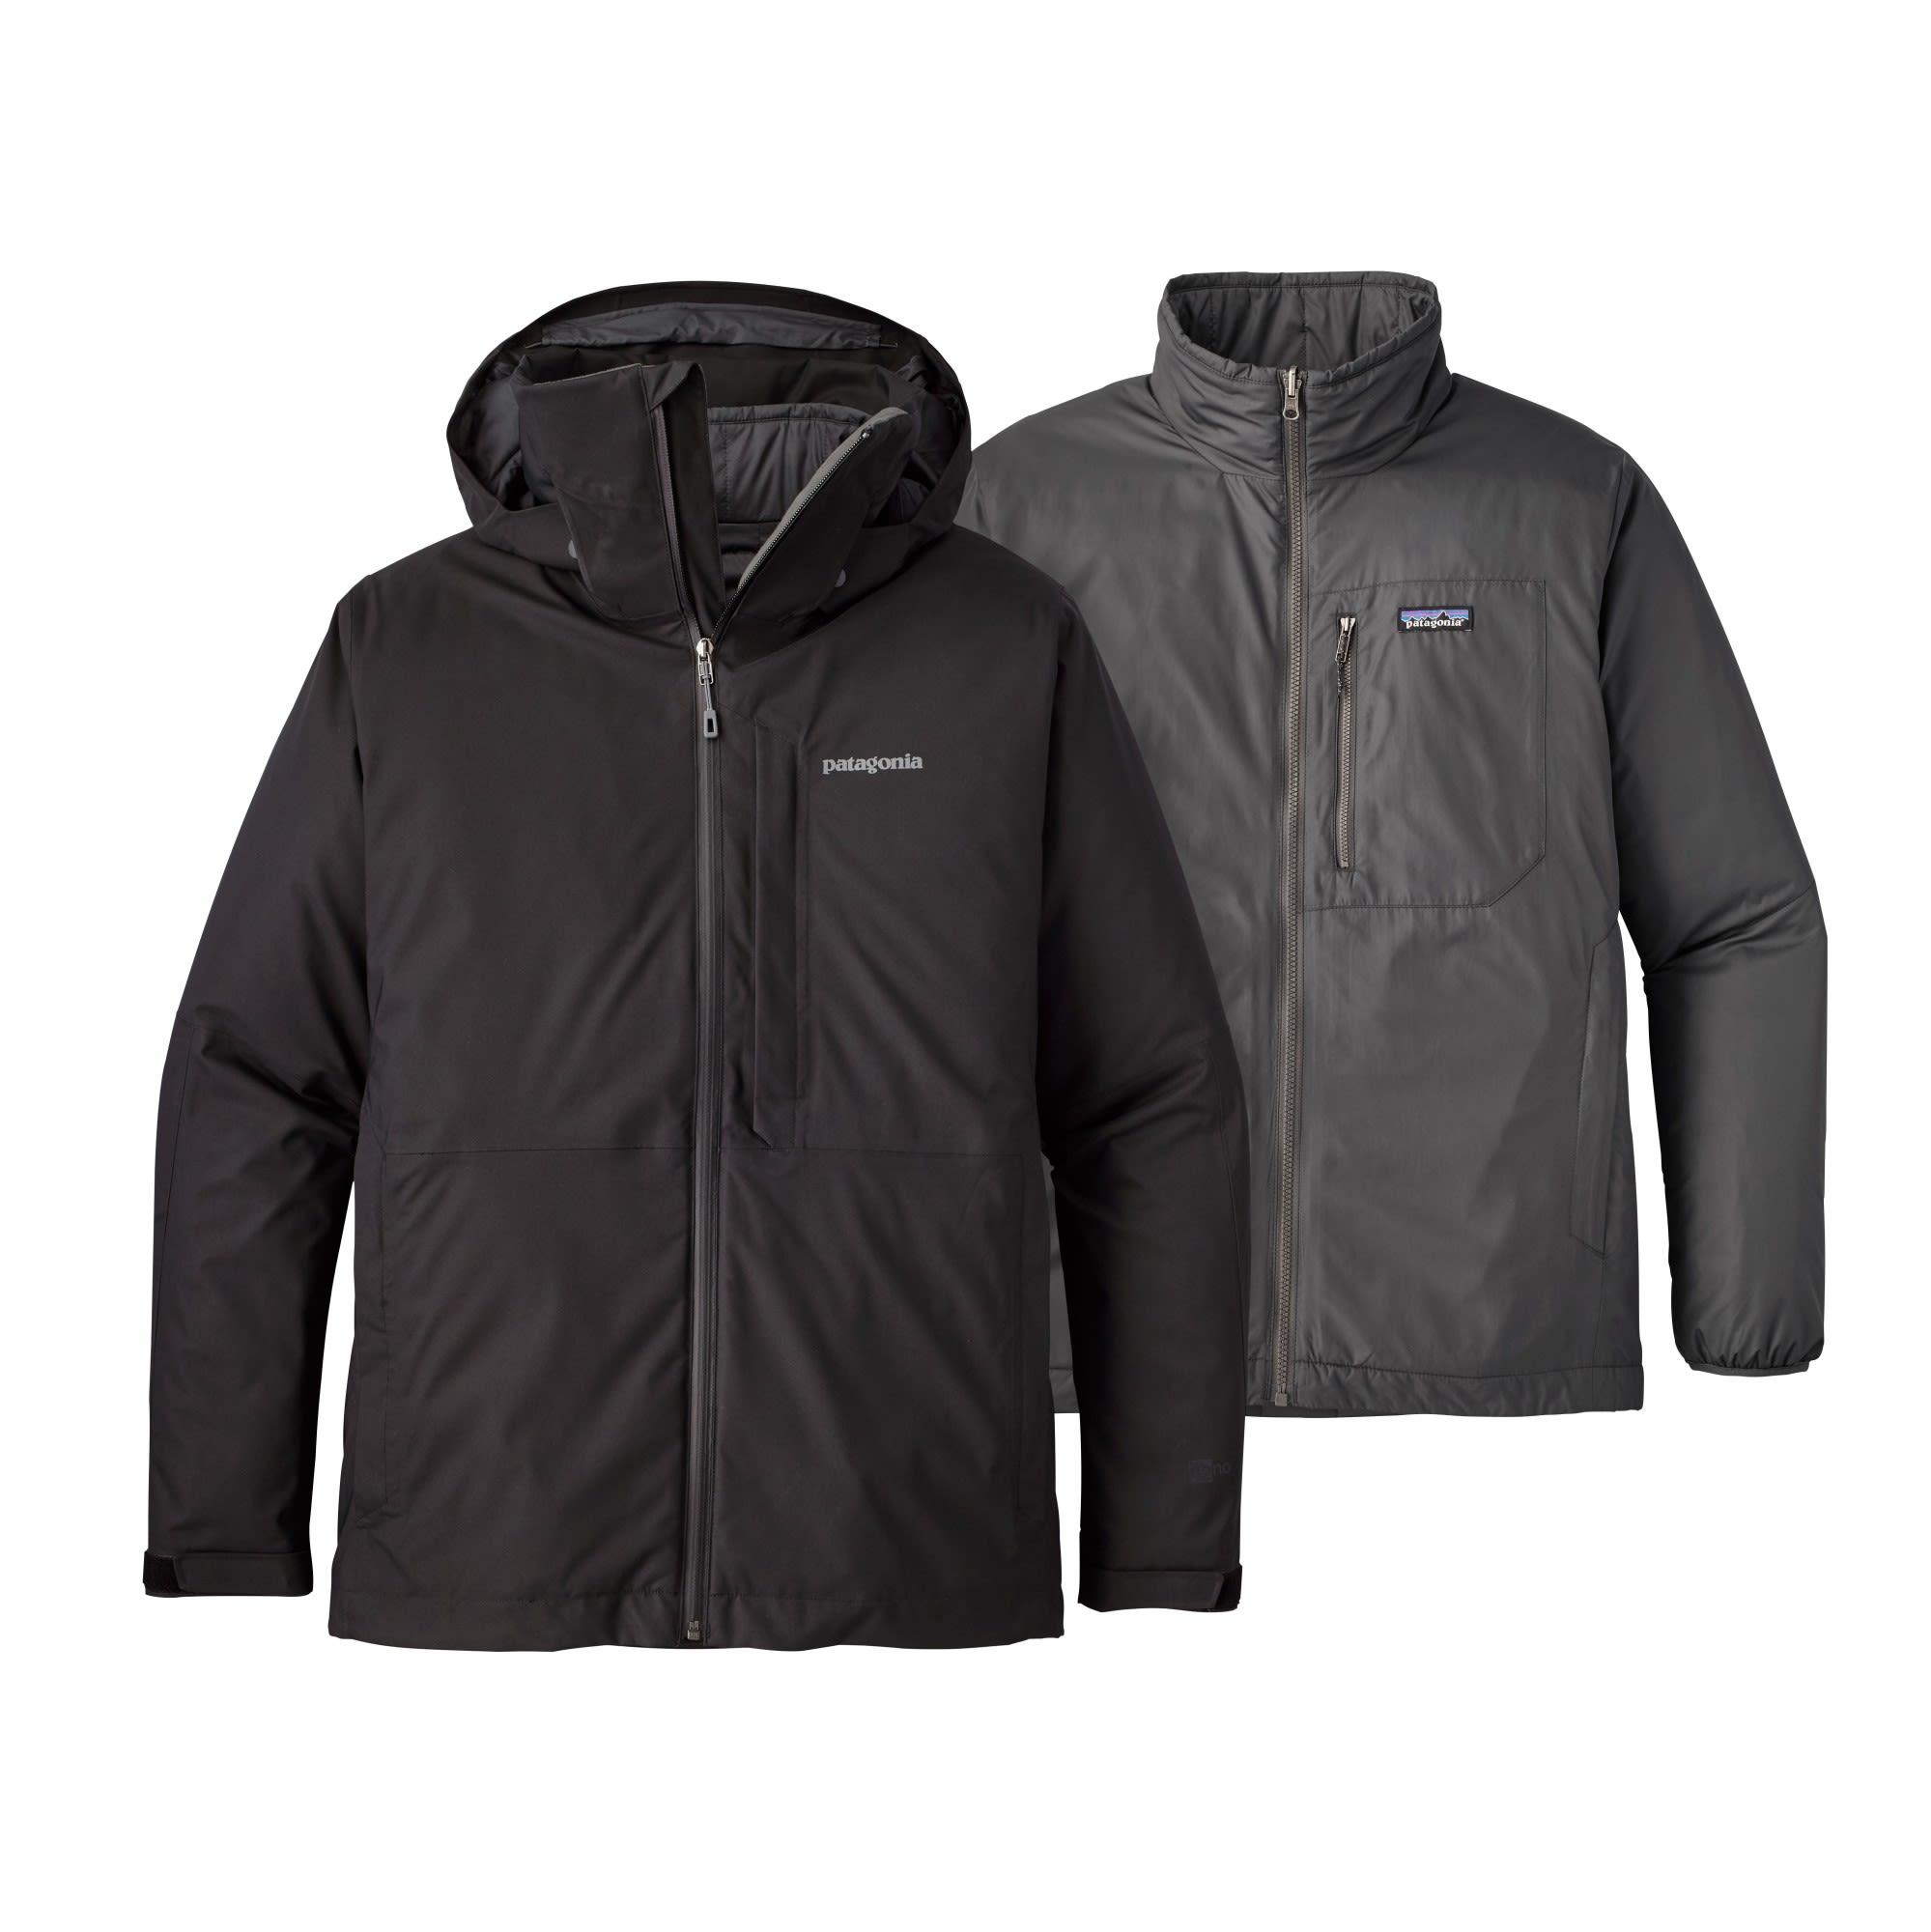 Patagonia M 3-IN-1 Snowshot Jacket | Größe M,XL | Herren Doppeljacke / 3-in-1-